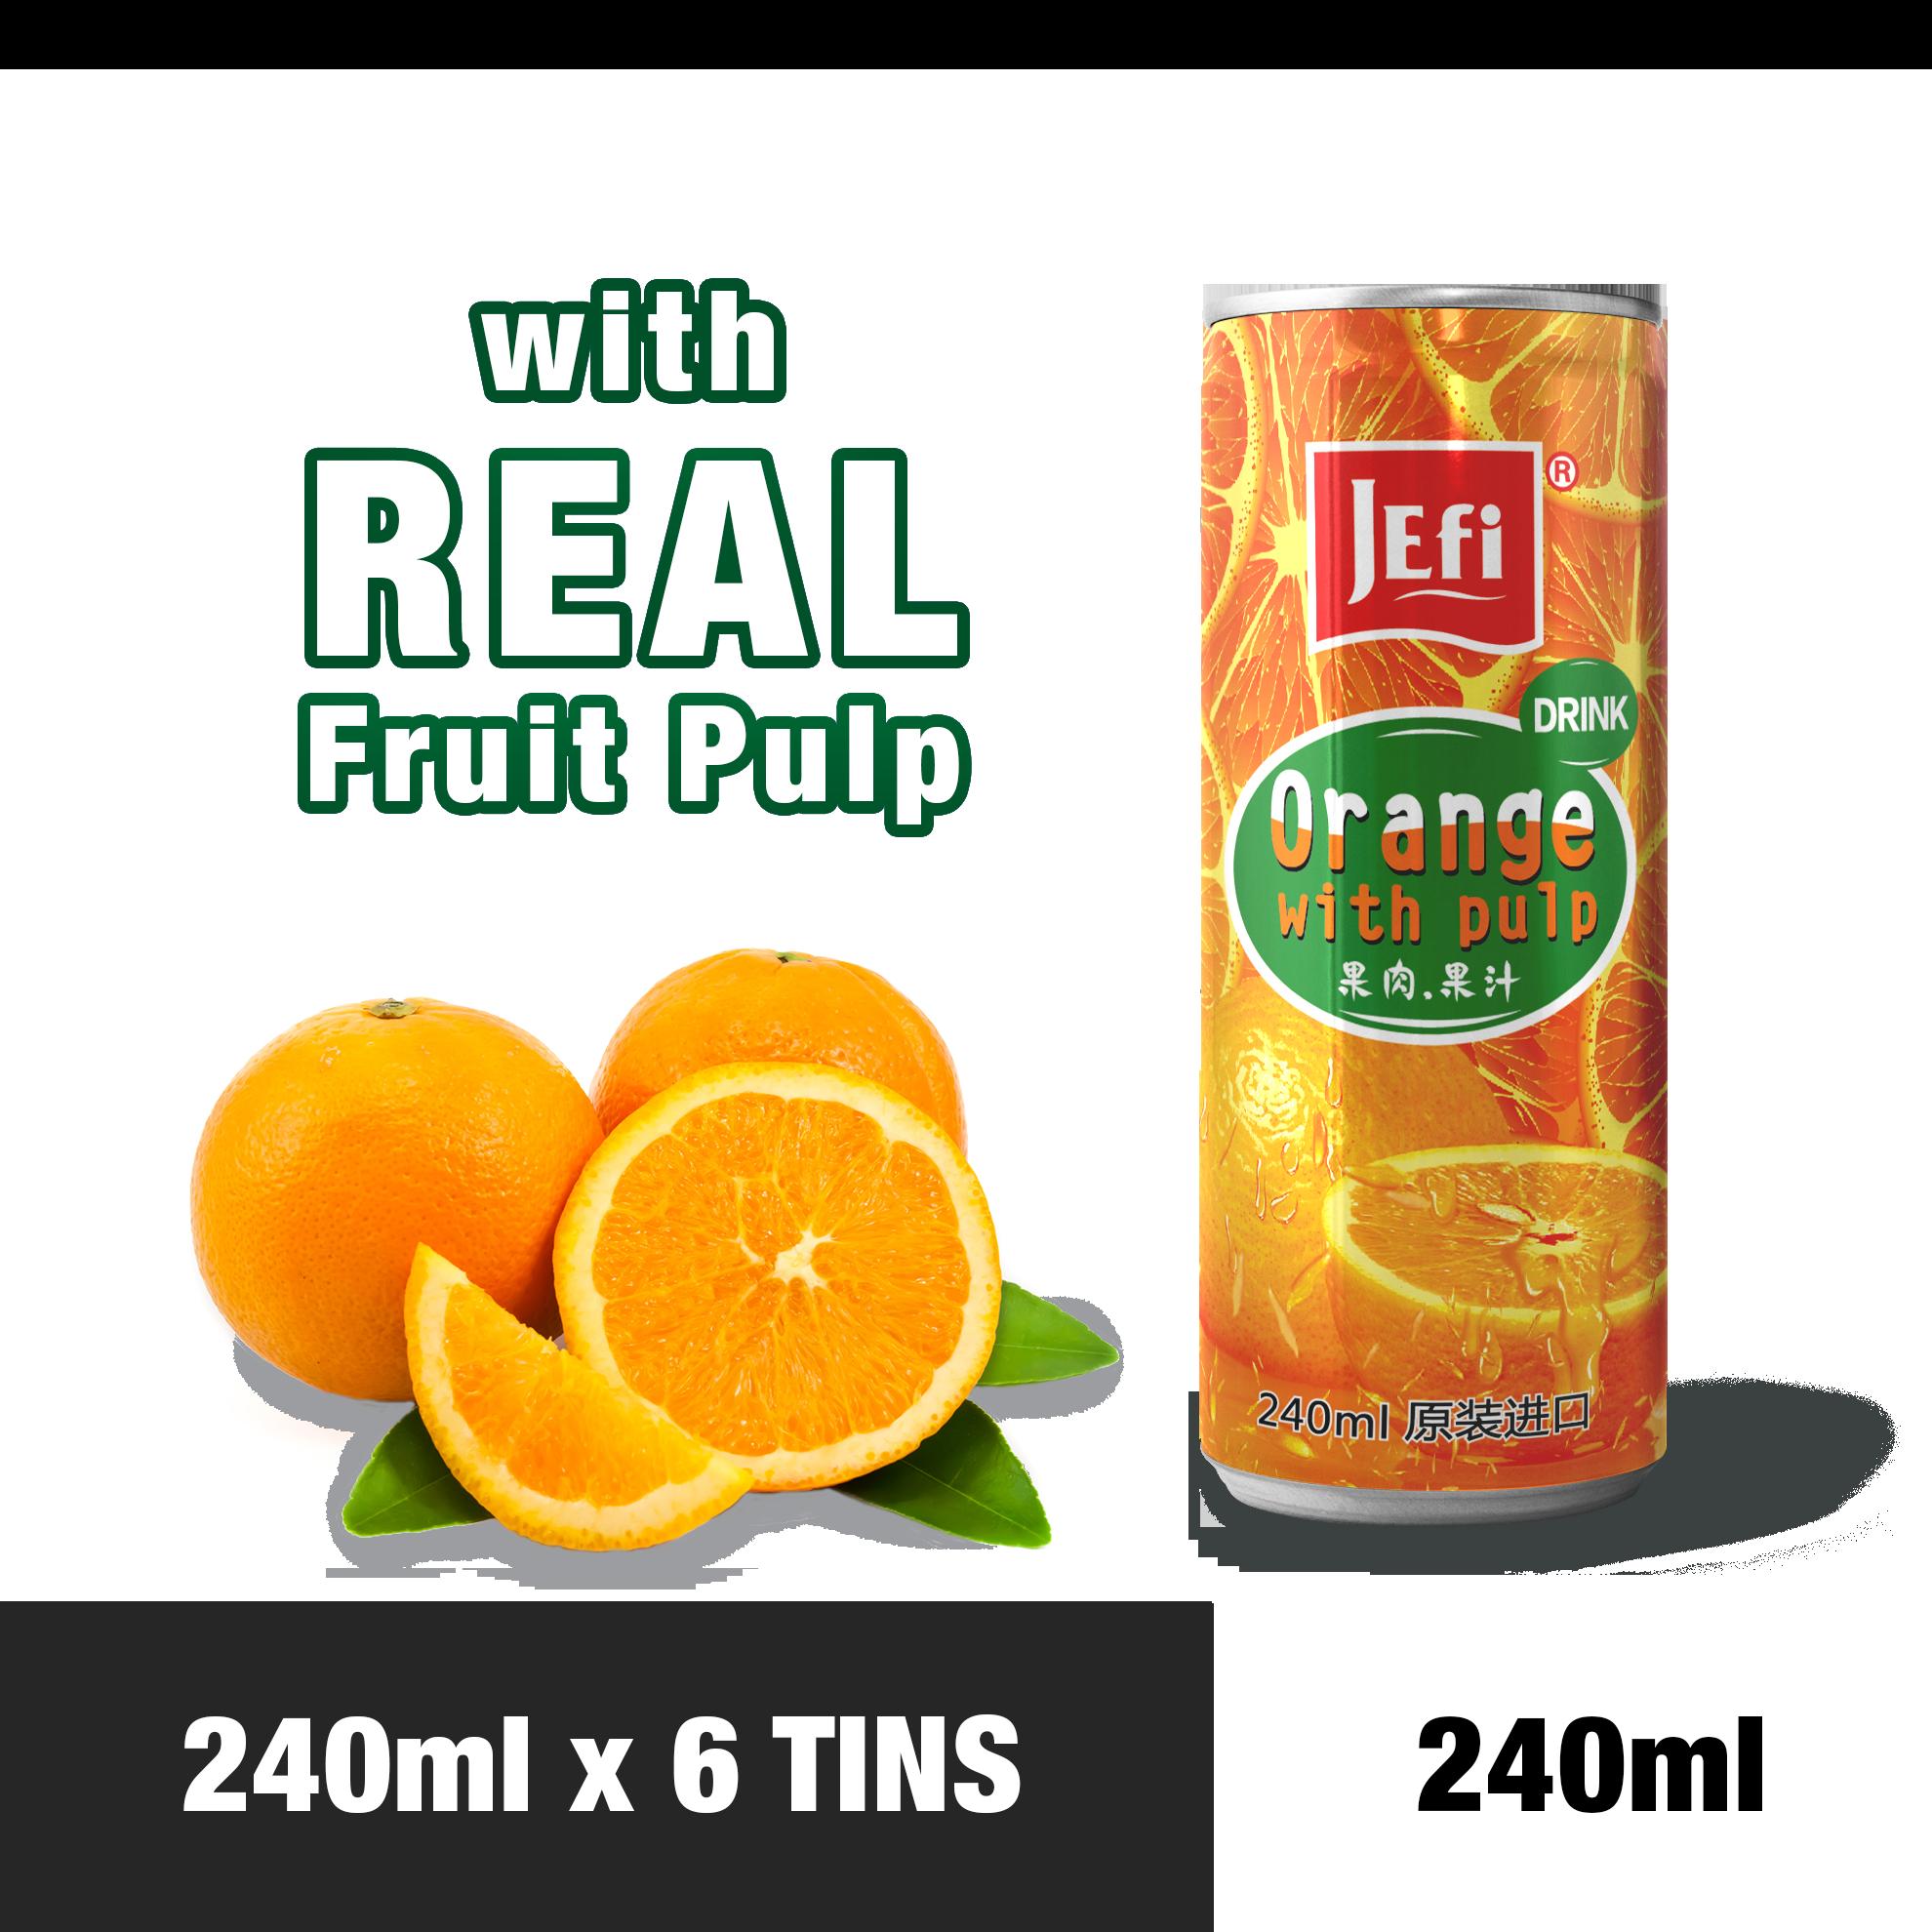 JEFI Orange Drink with Real Fruit Sac (240ml x 6tins)